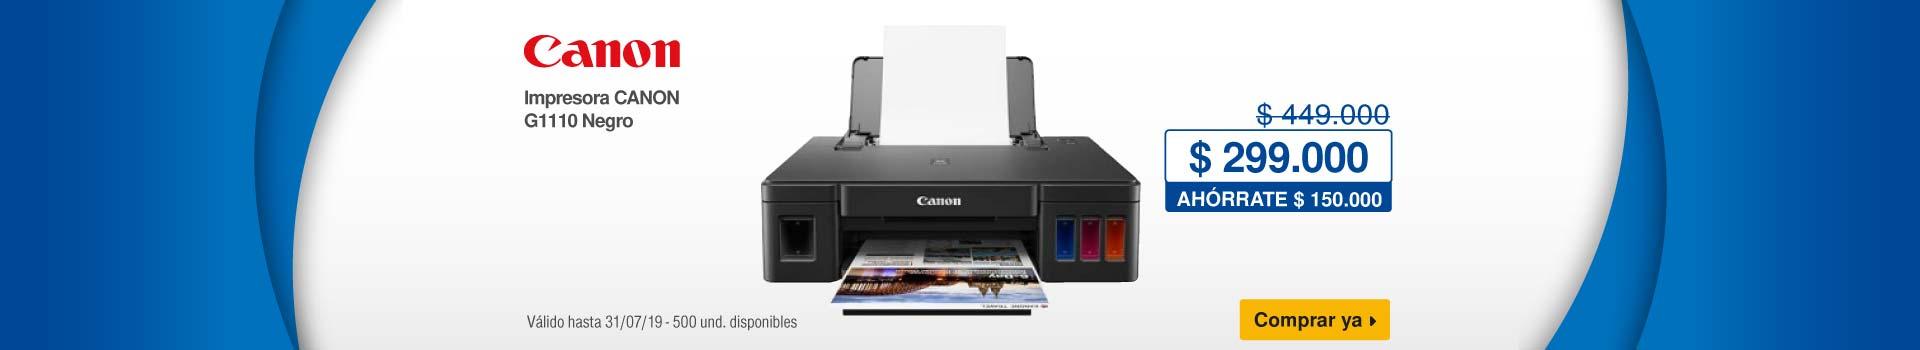 AK-KT-Canon-impresora-G1110-HgBCAT-2-impresion06_julio